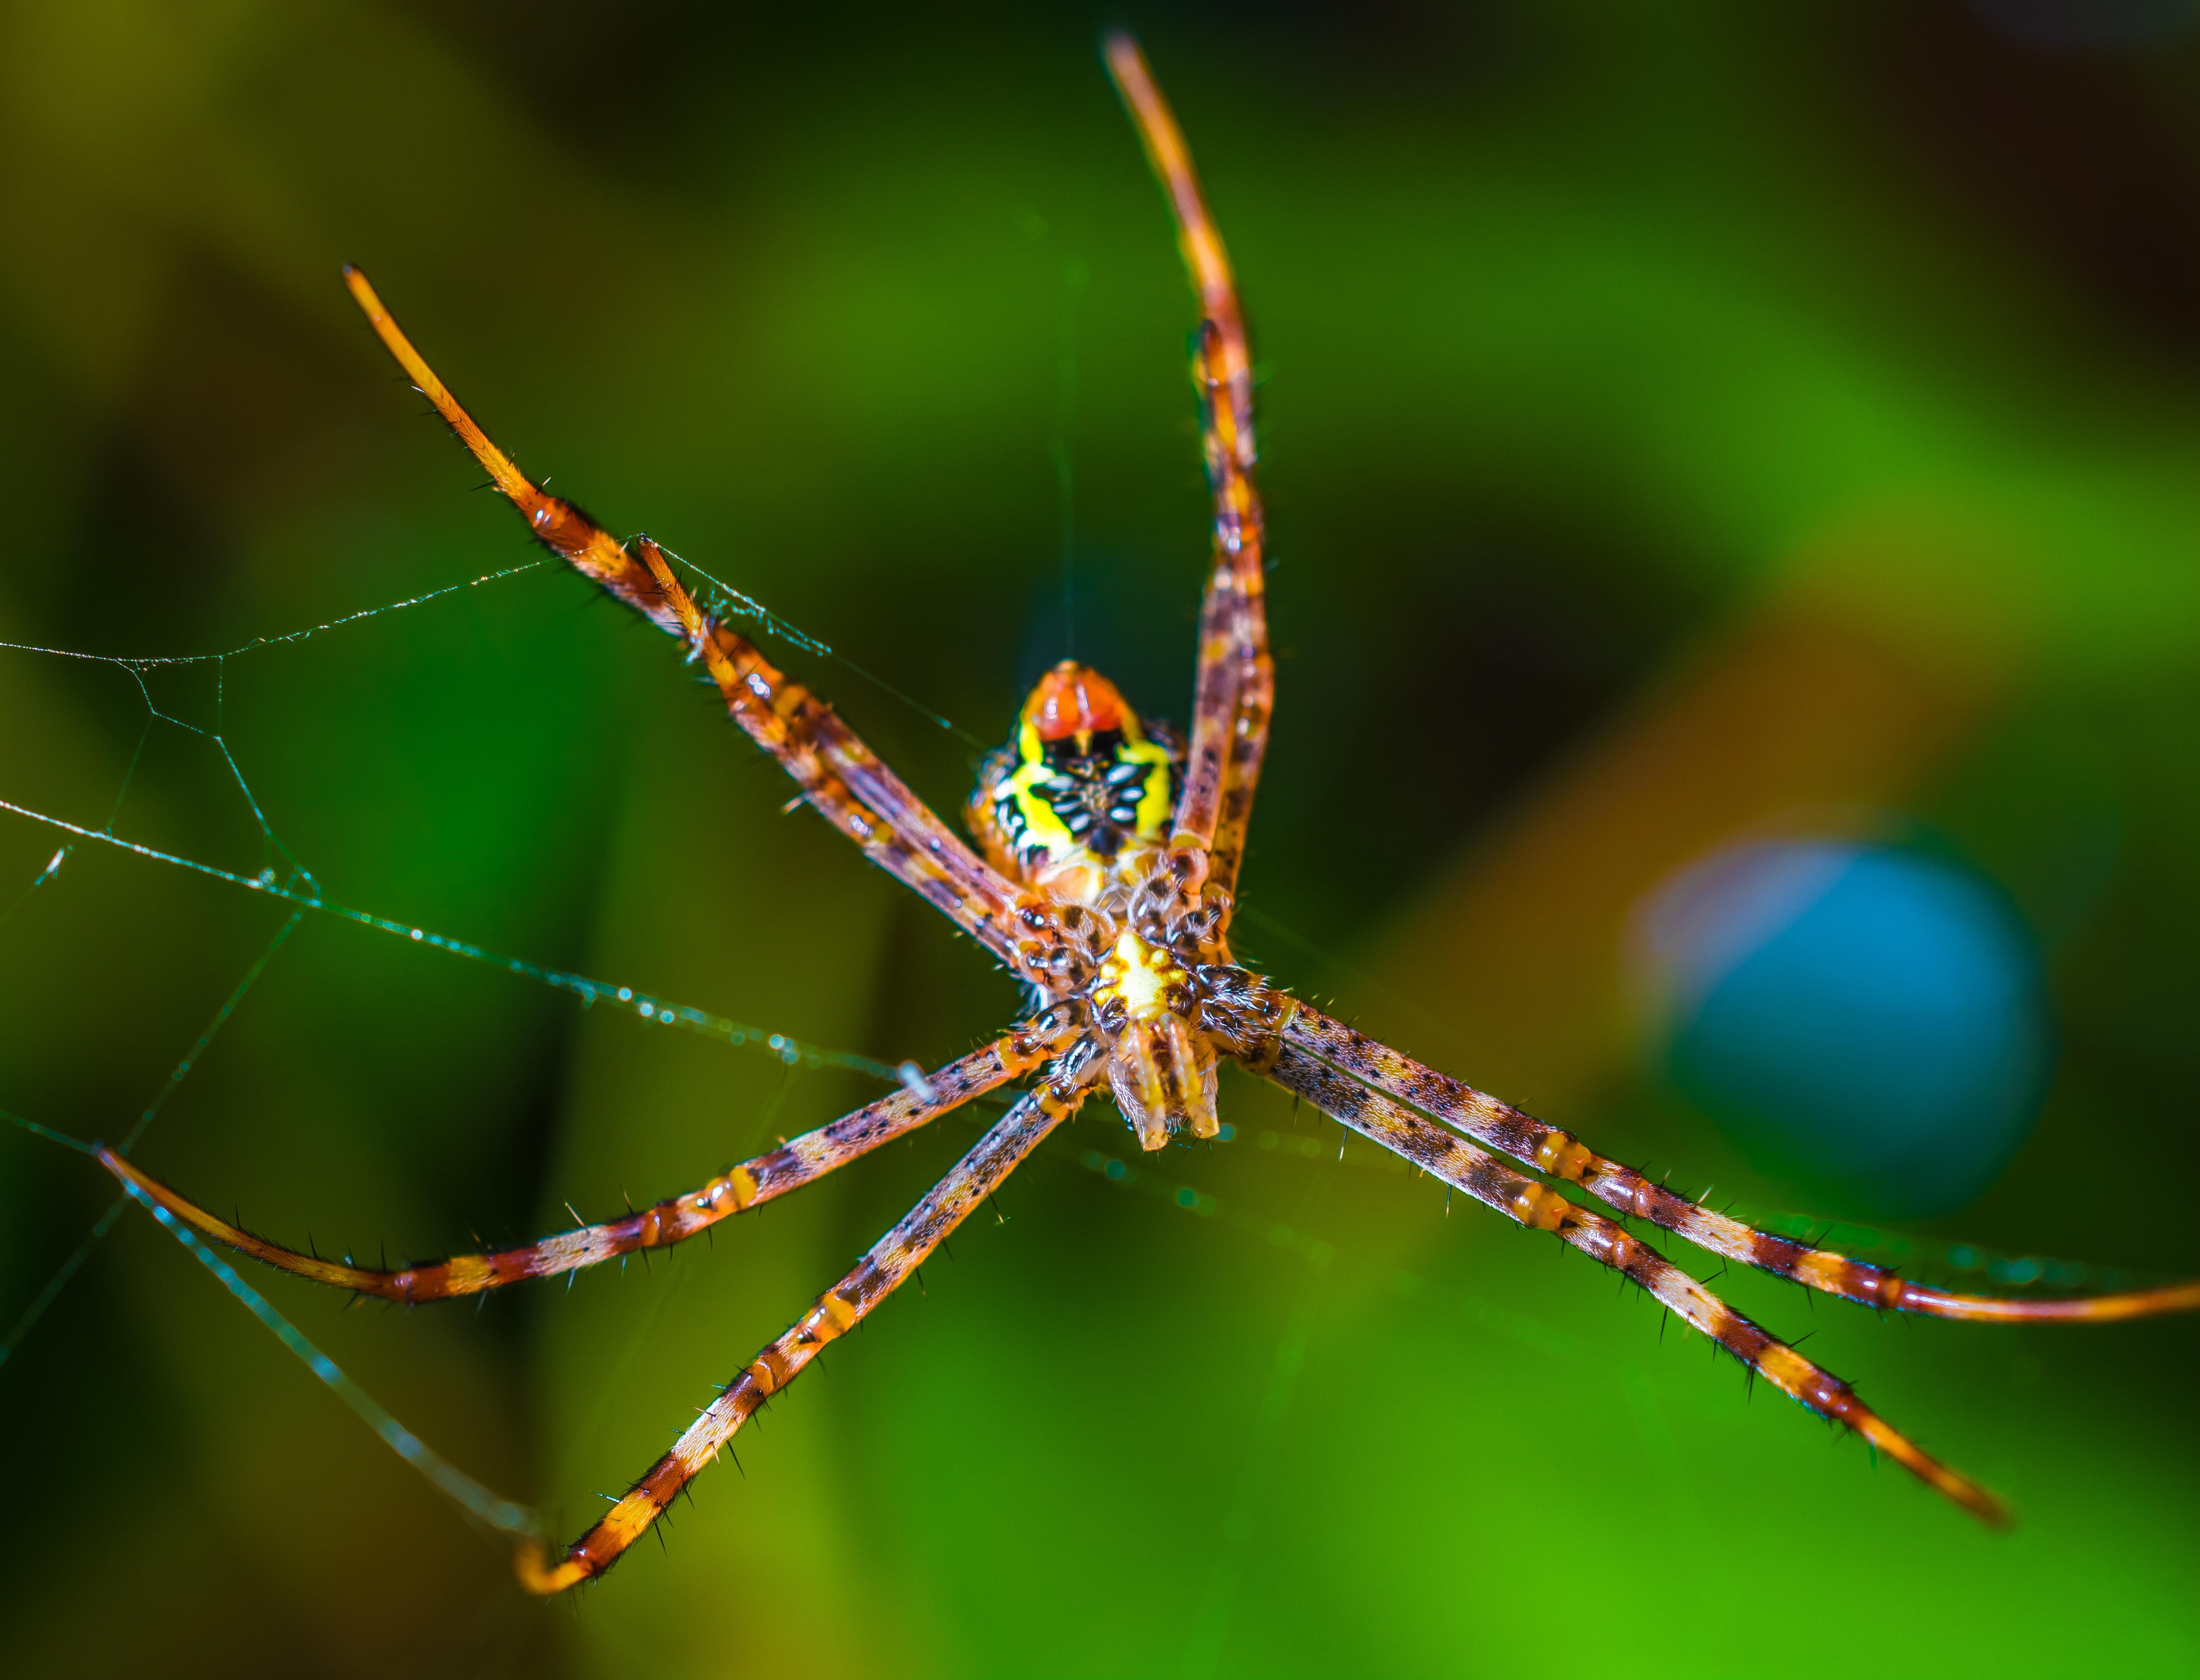 Садовый паук картинка